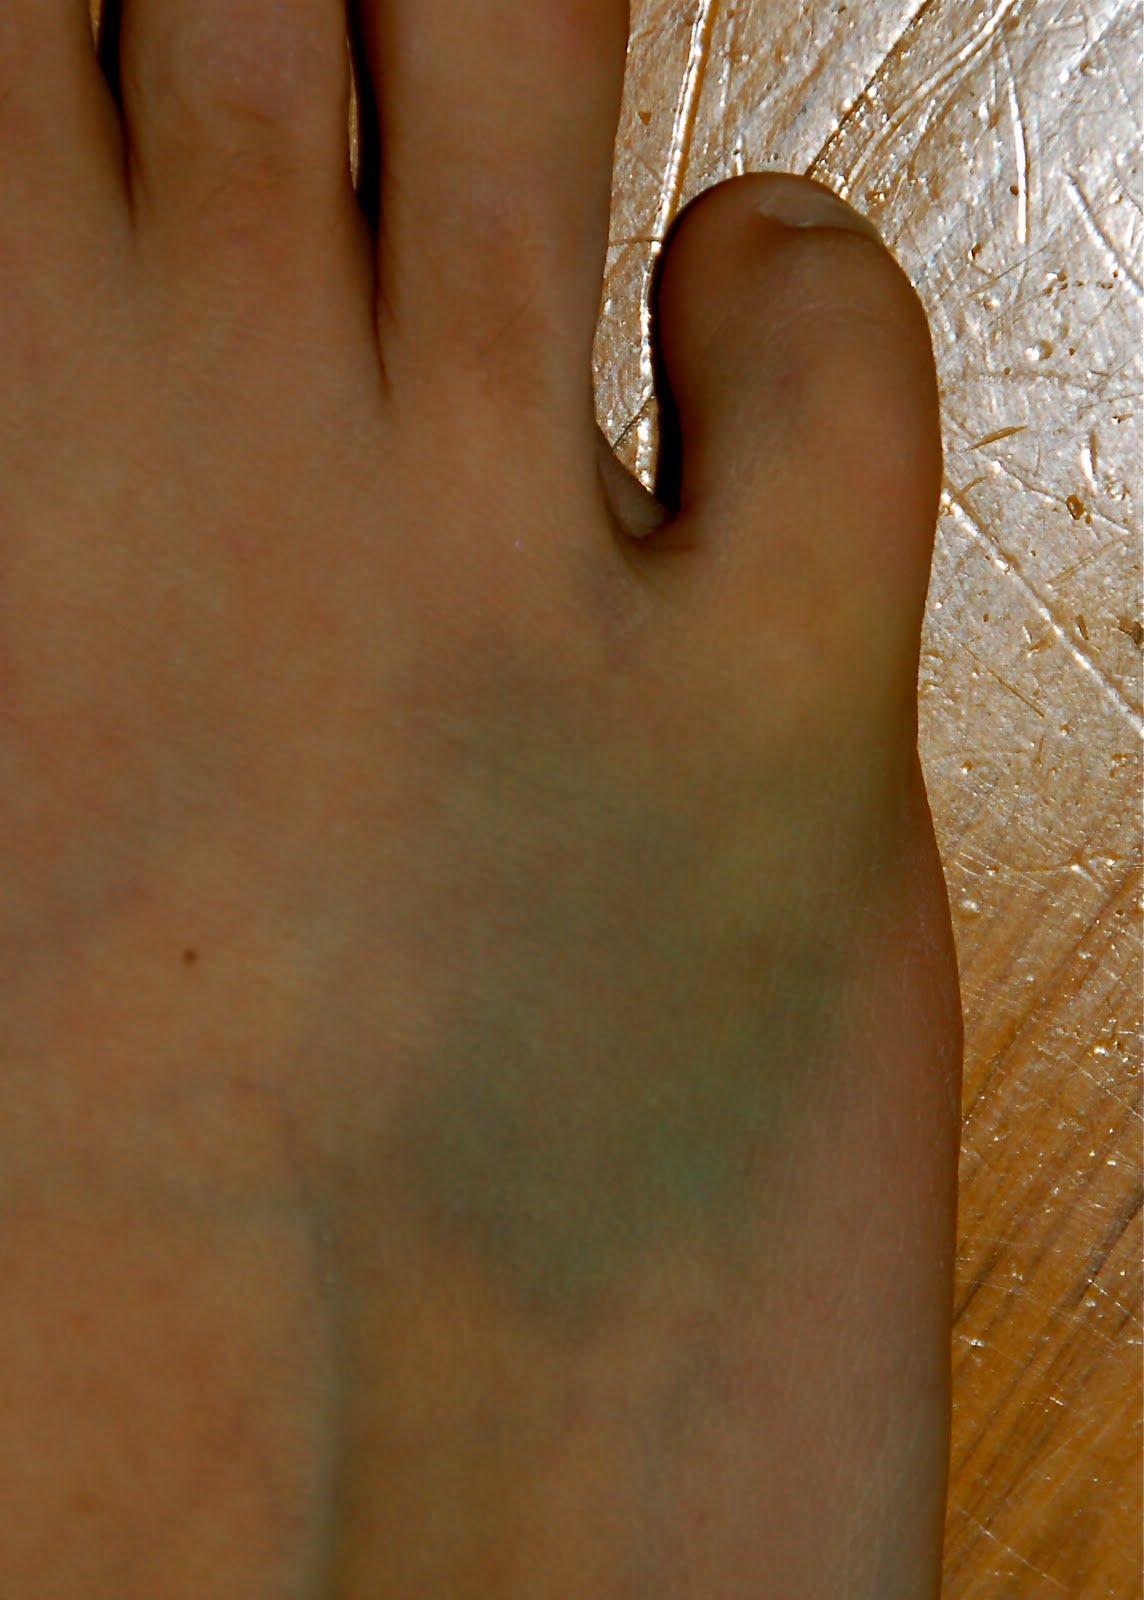 Big Toe Fracture - Fracture Treatment